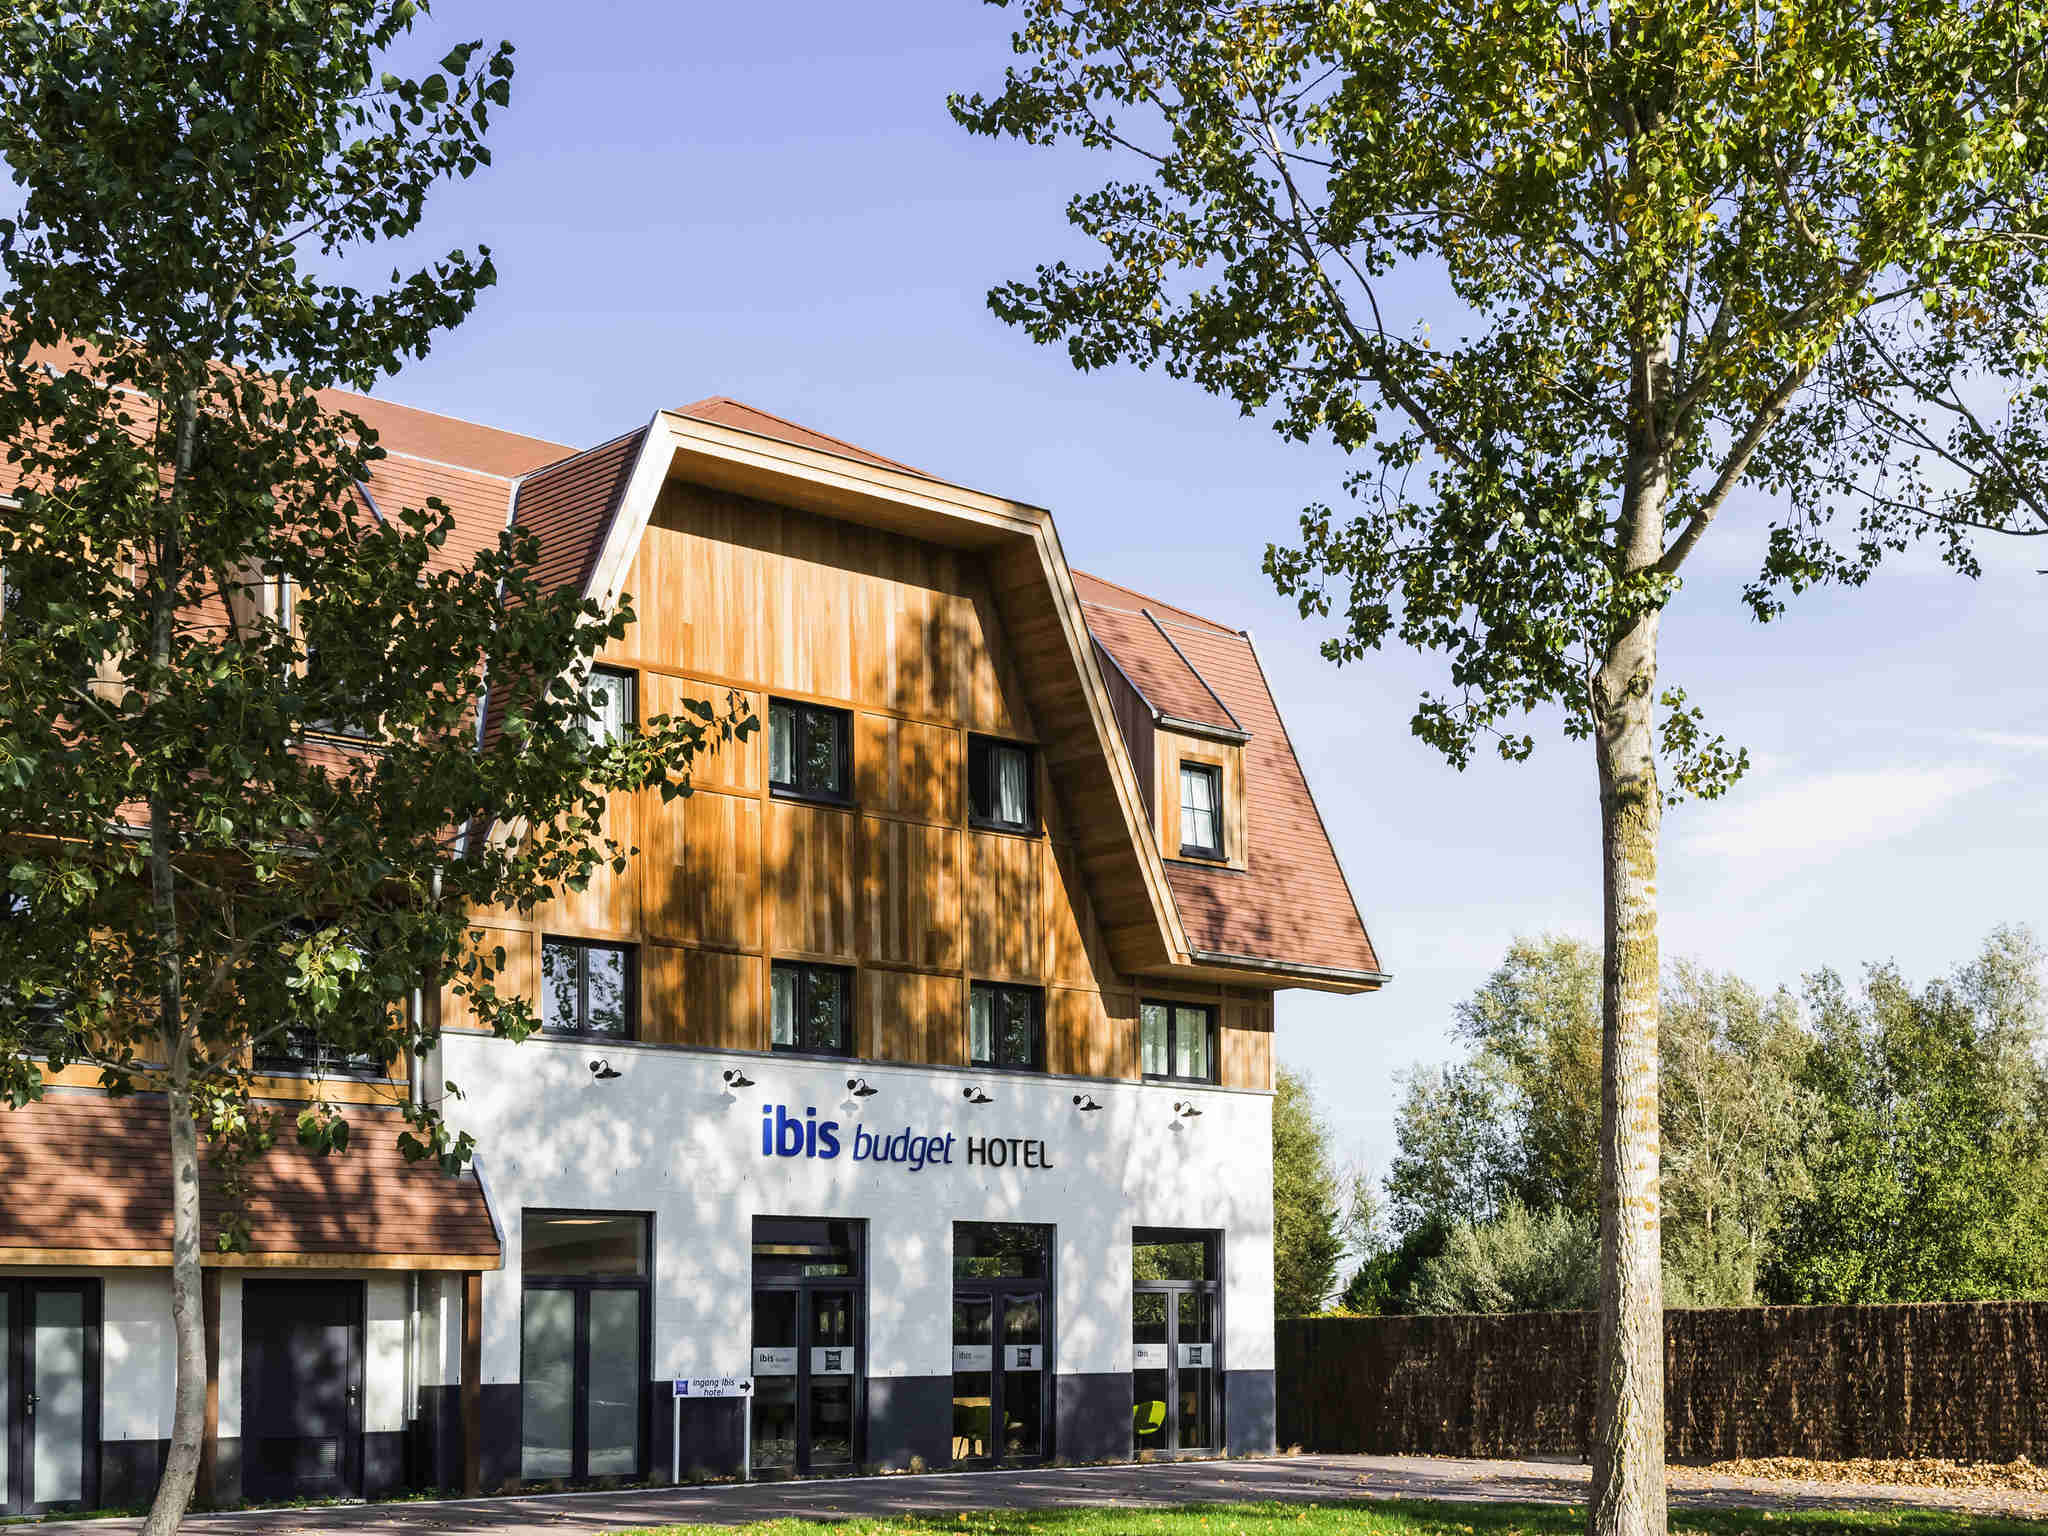 Hotel – ibis budget Knokke (apertura settembre 2018)